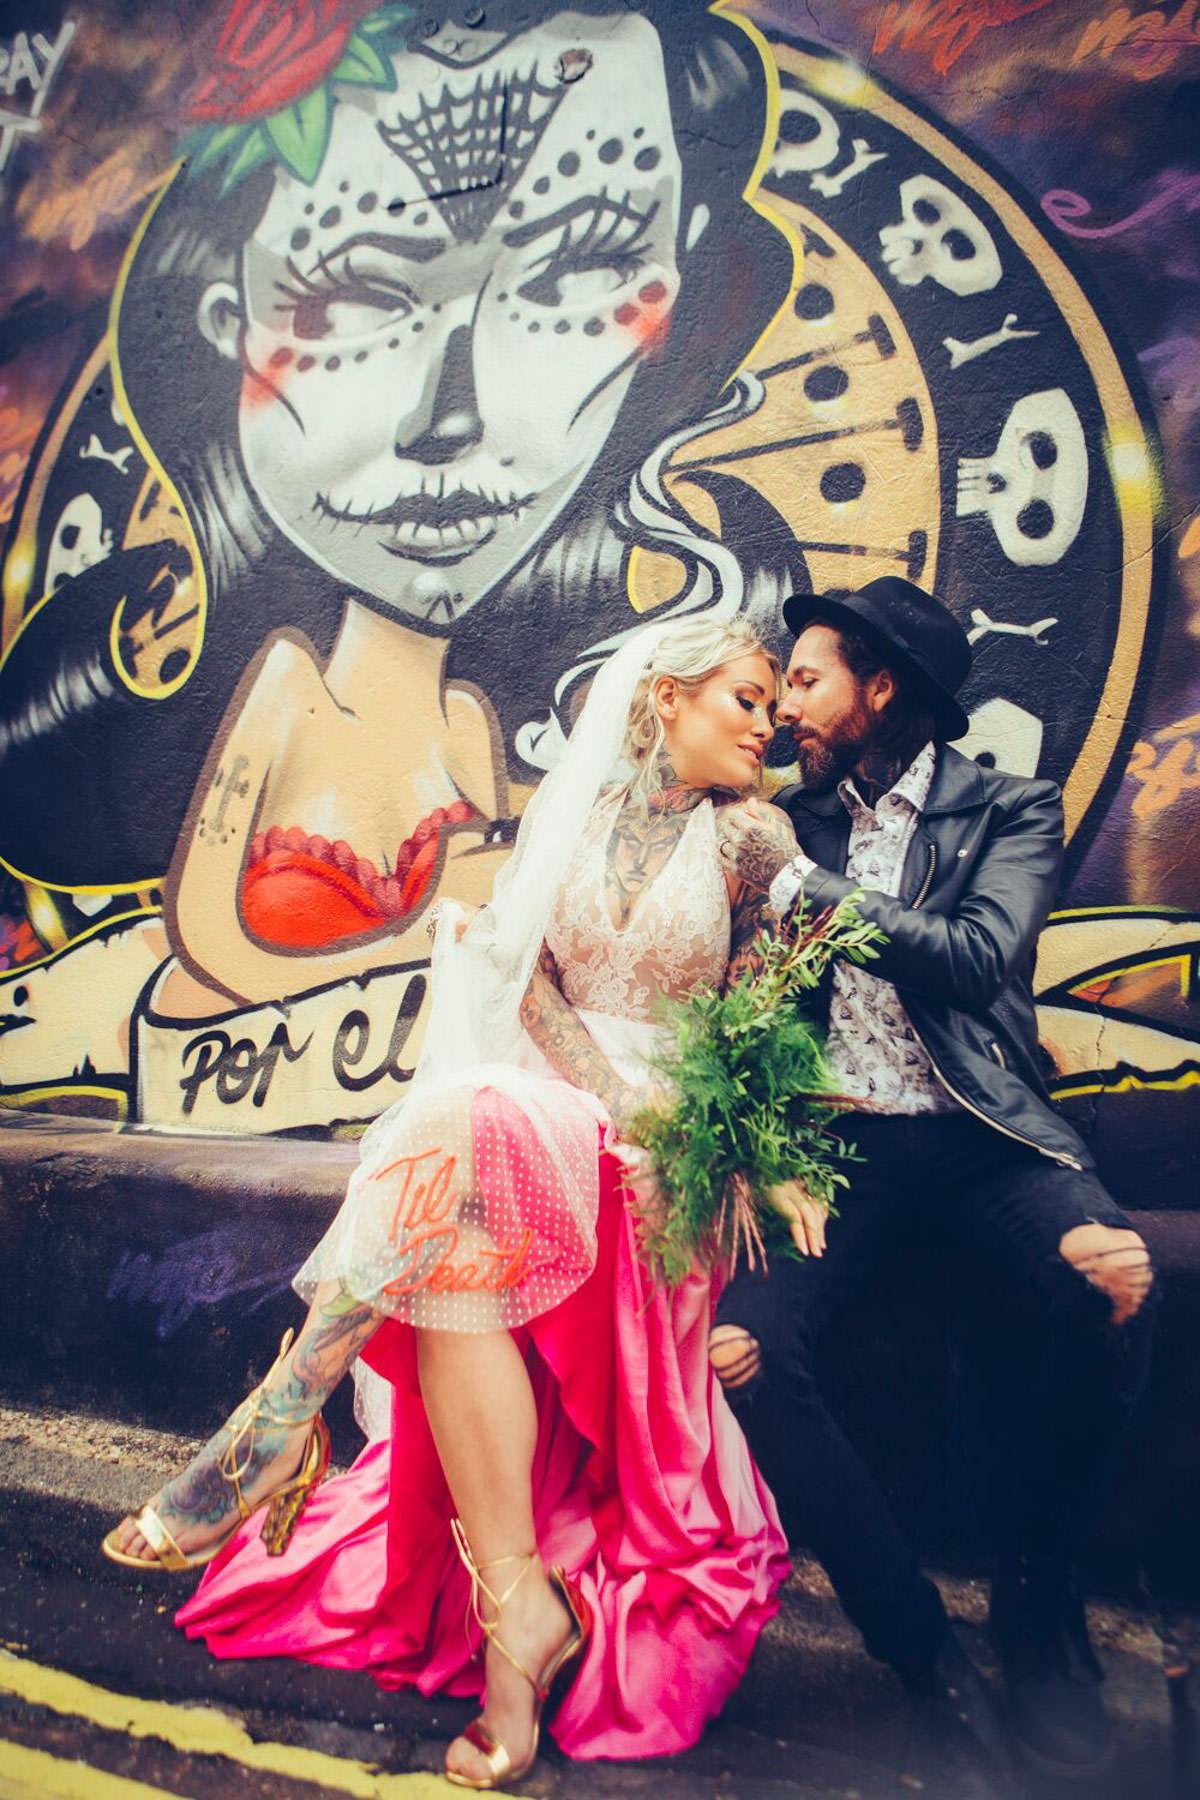 edgy tattoo bride wearing pink wedding dress